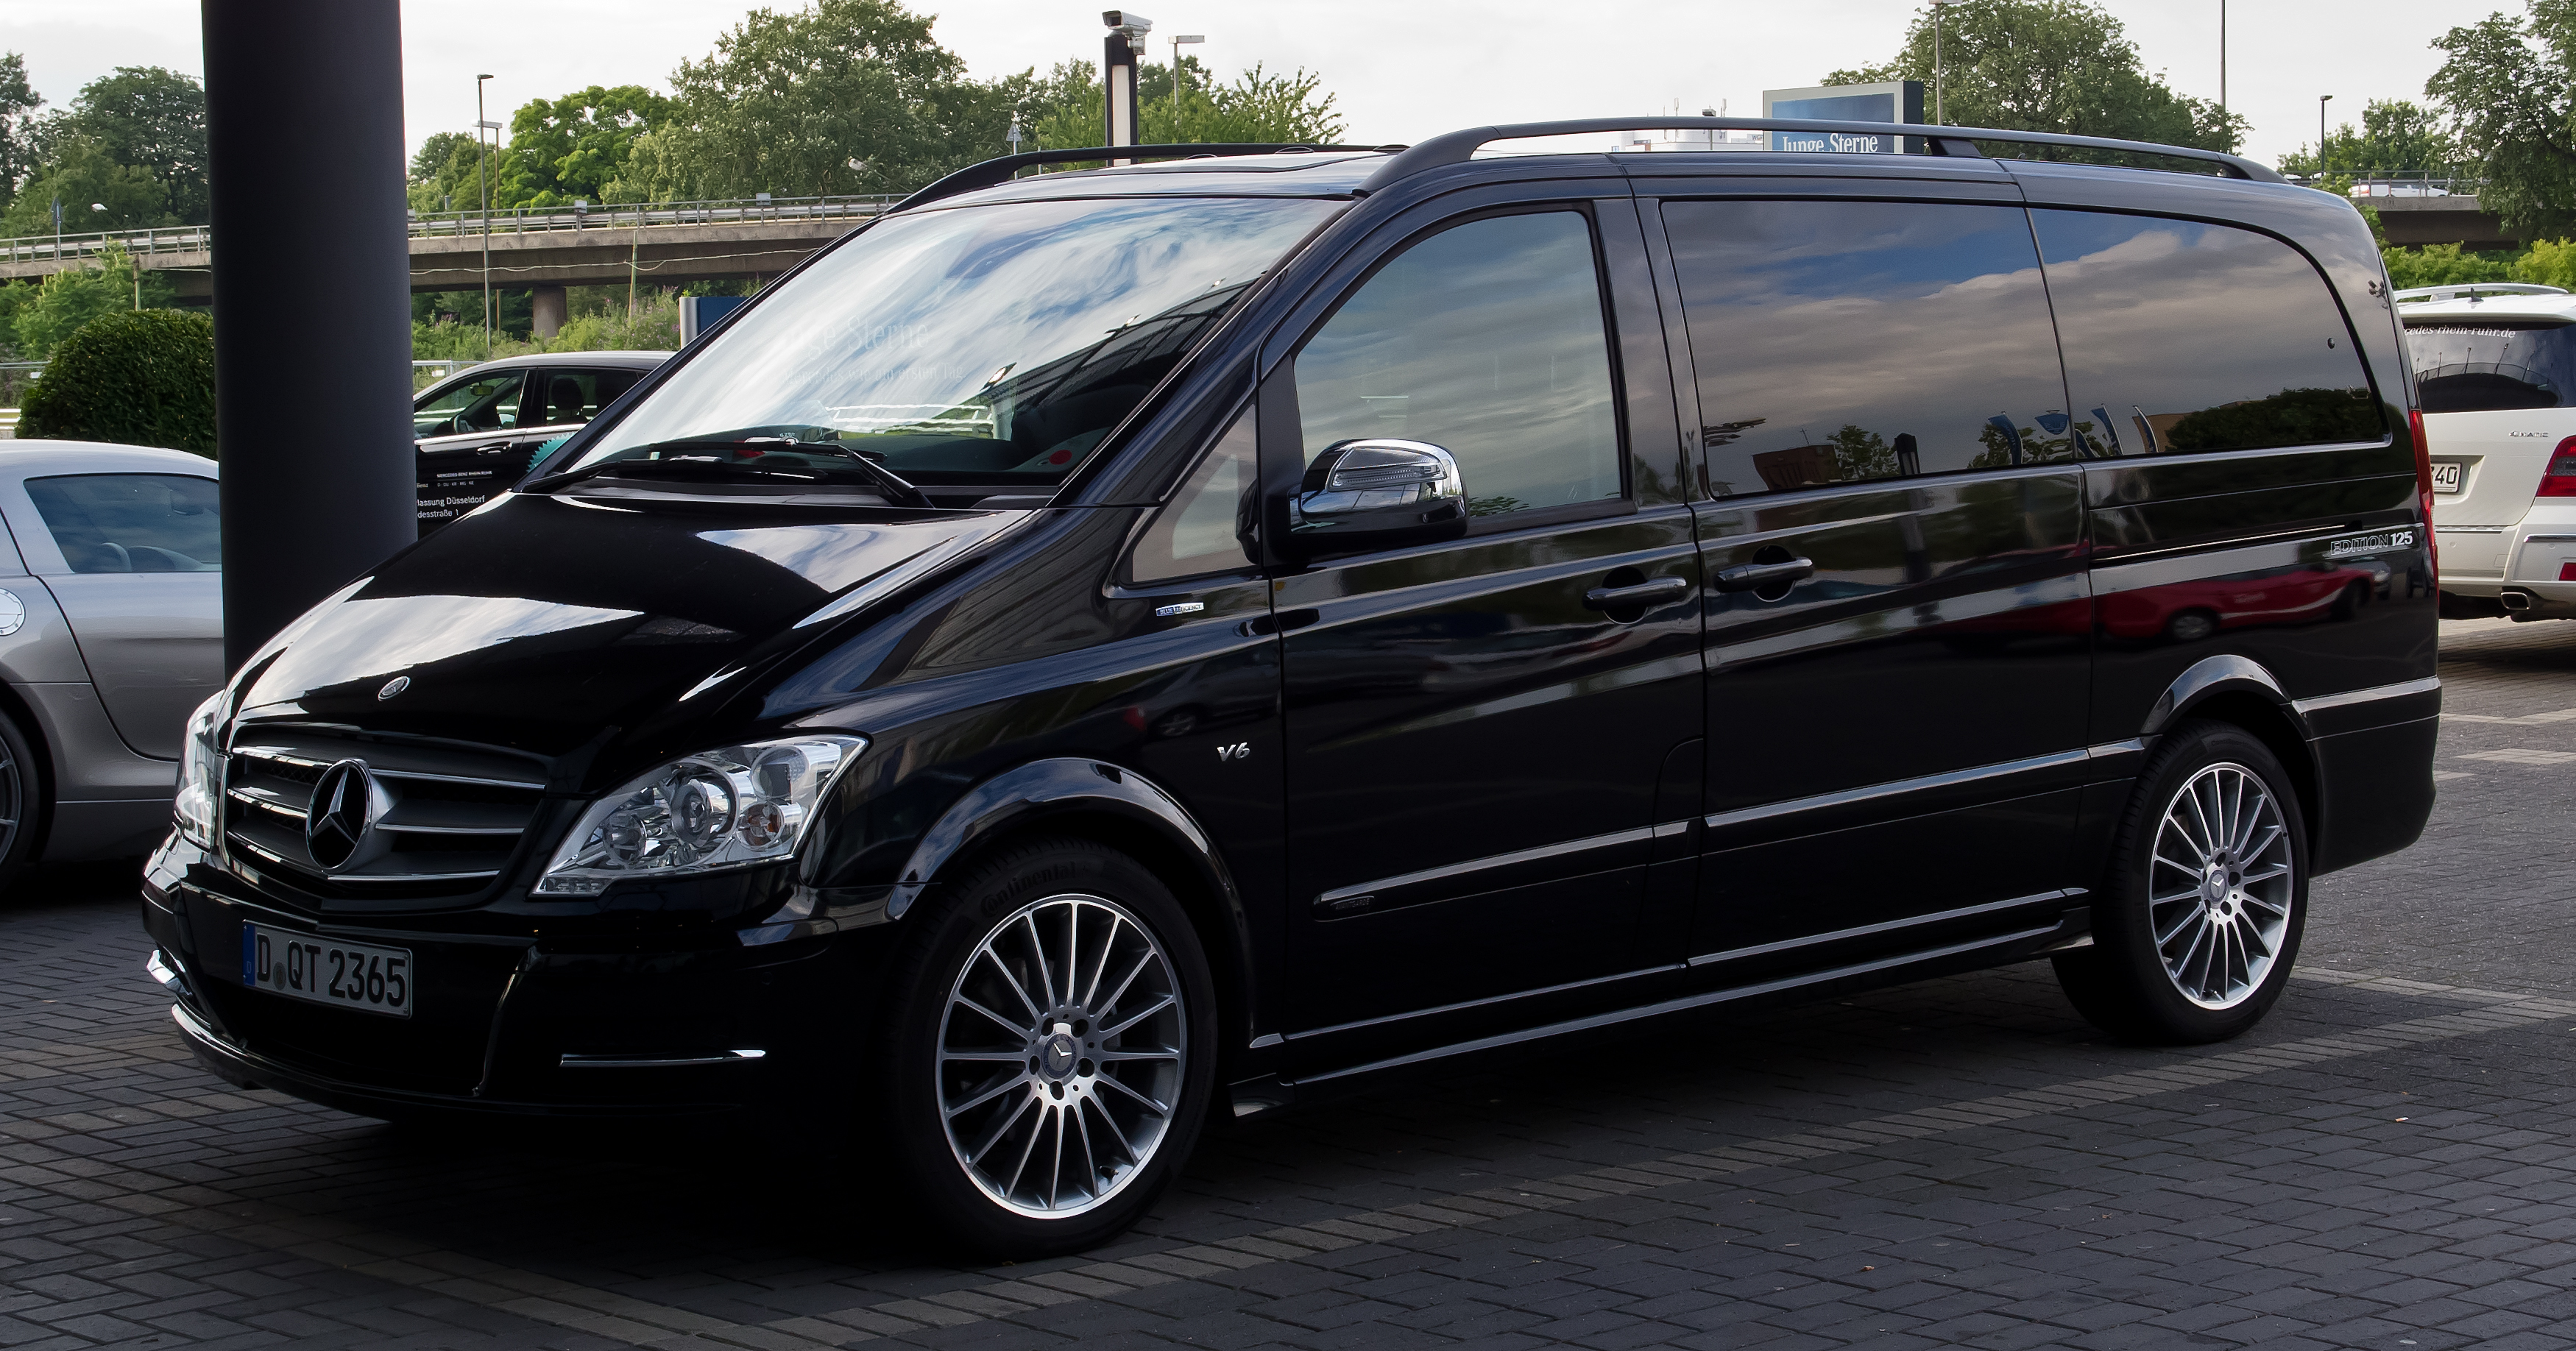 File:Mercedes Benz Viano Lang CDI 3.0 V6 BlueEFFICIENCY Avantgarde